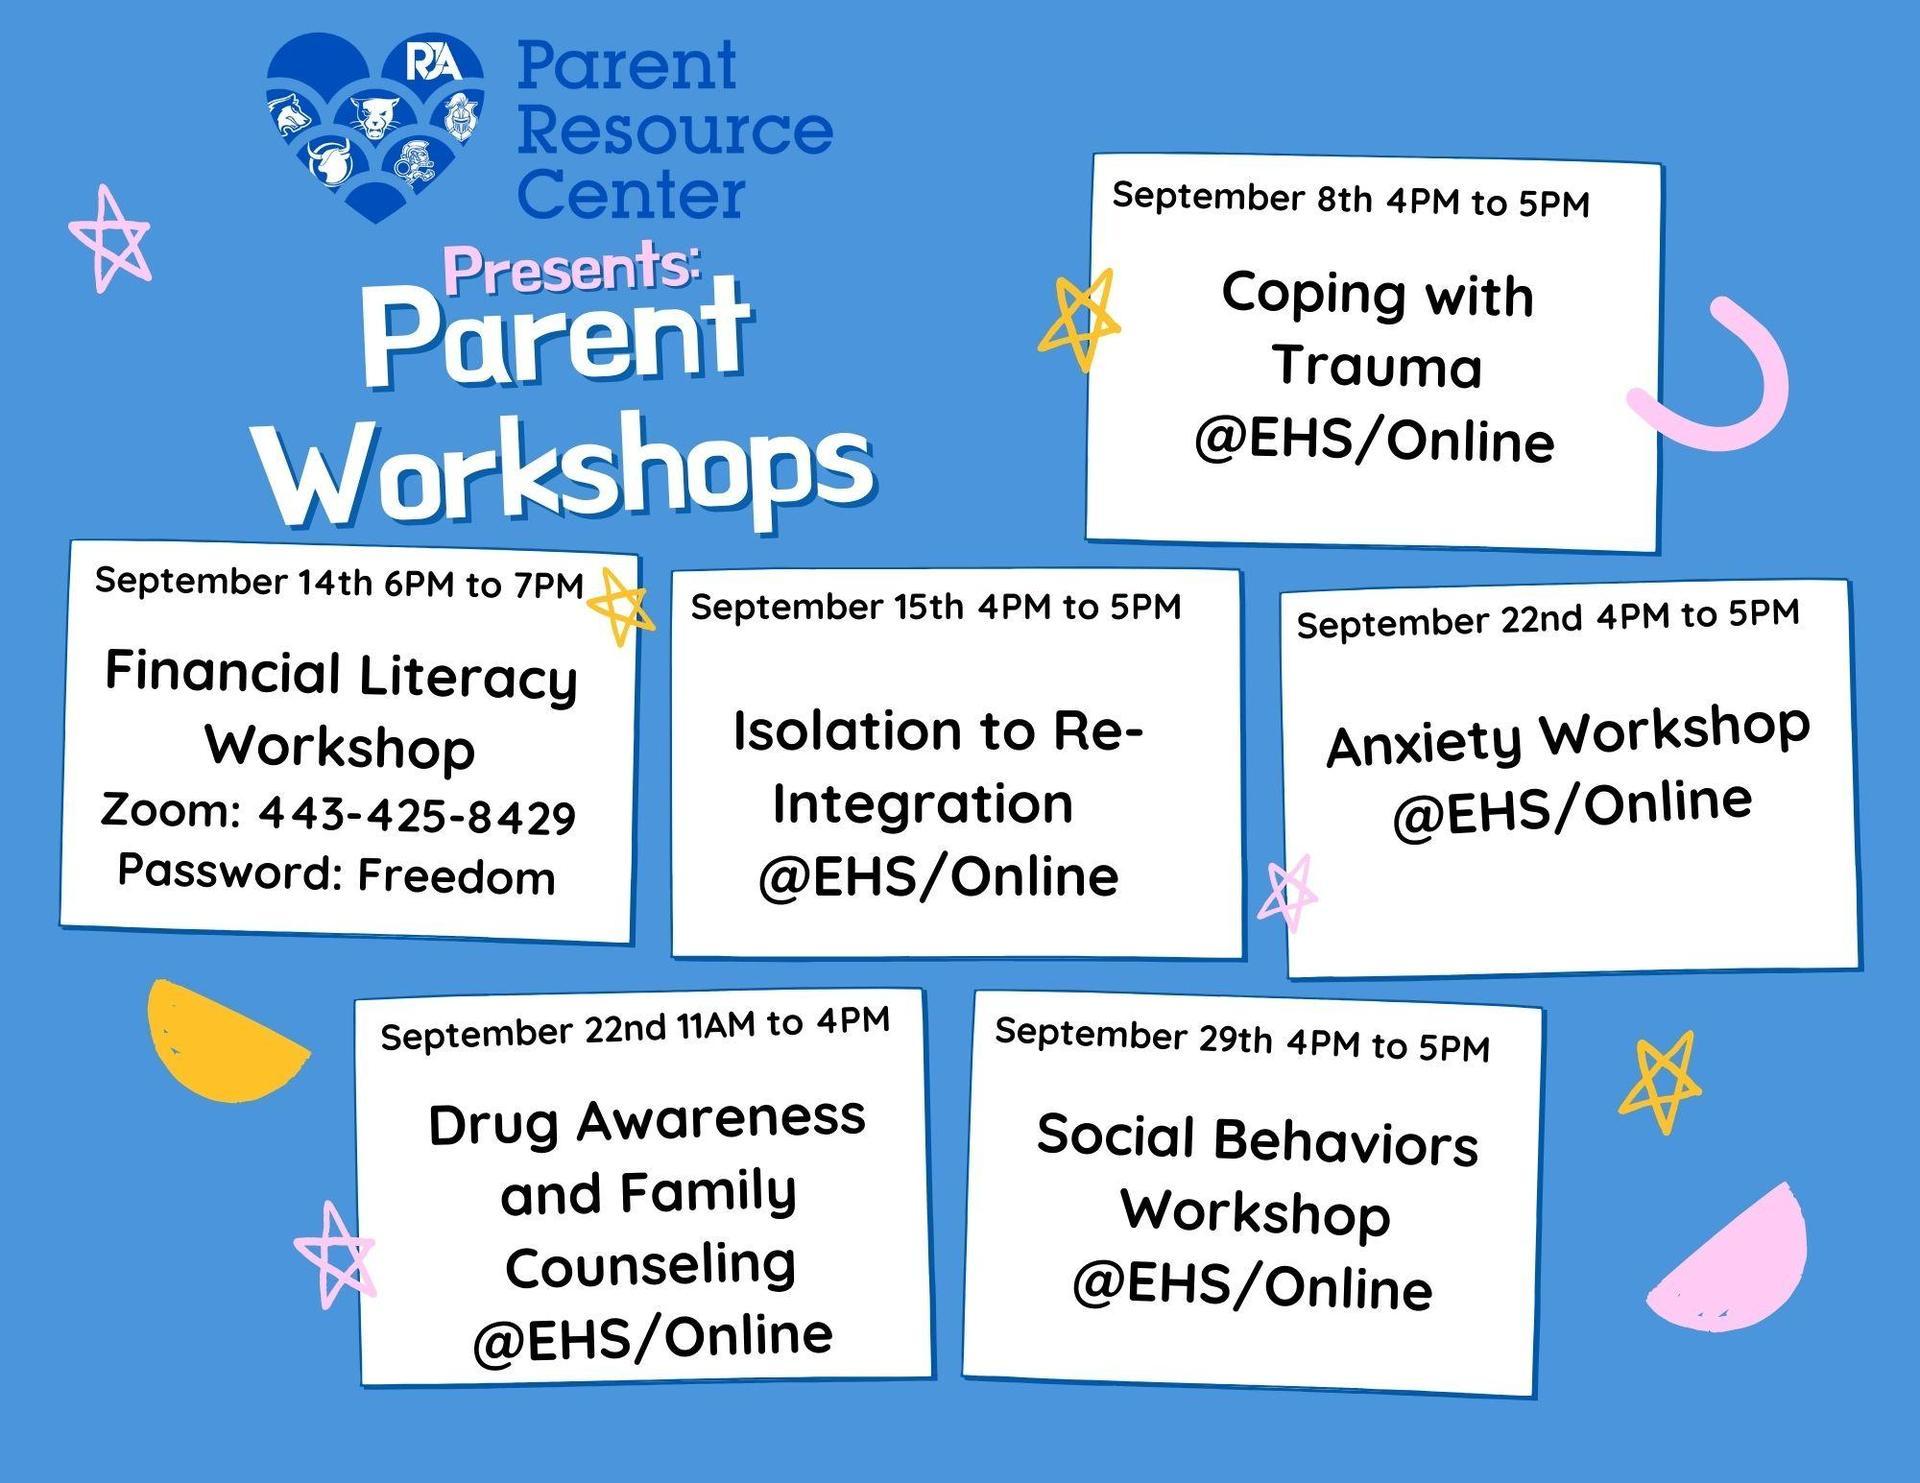 RJA Parent Center presents Parent University. Workshops for all of September.